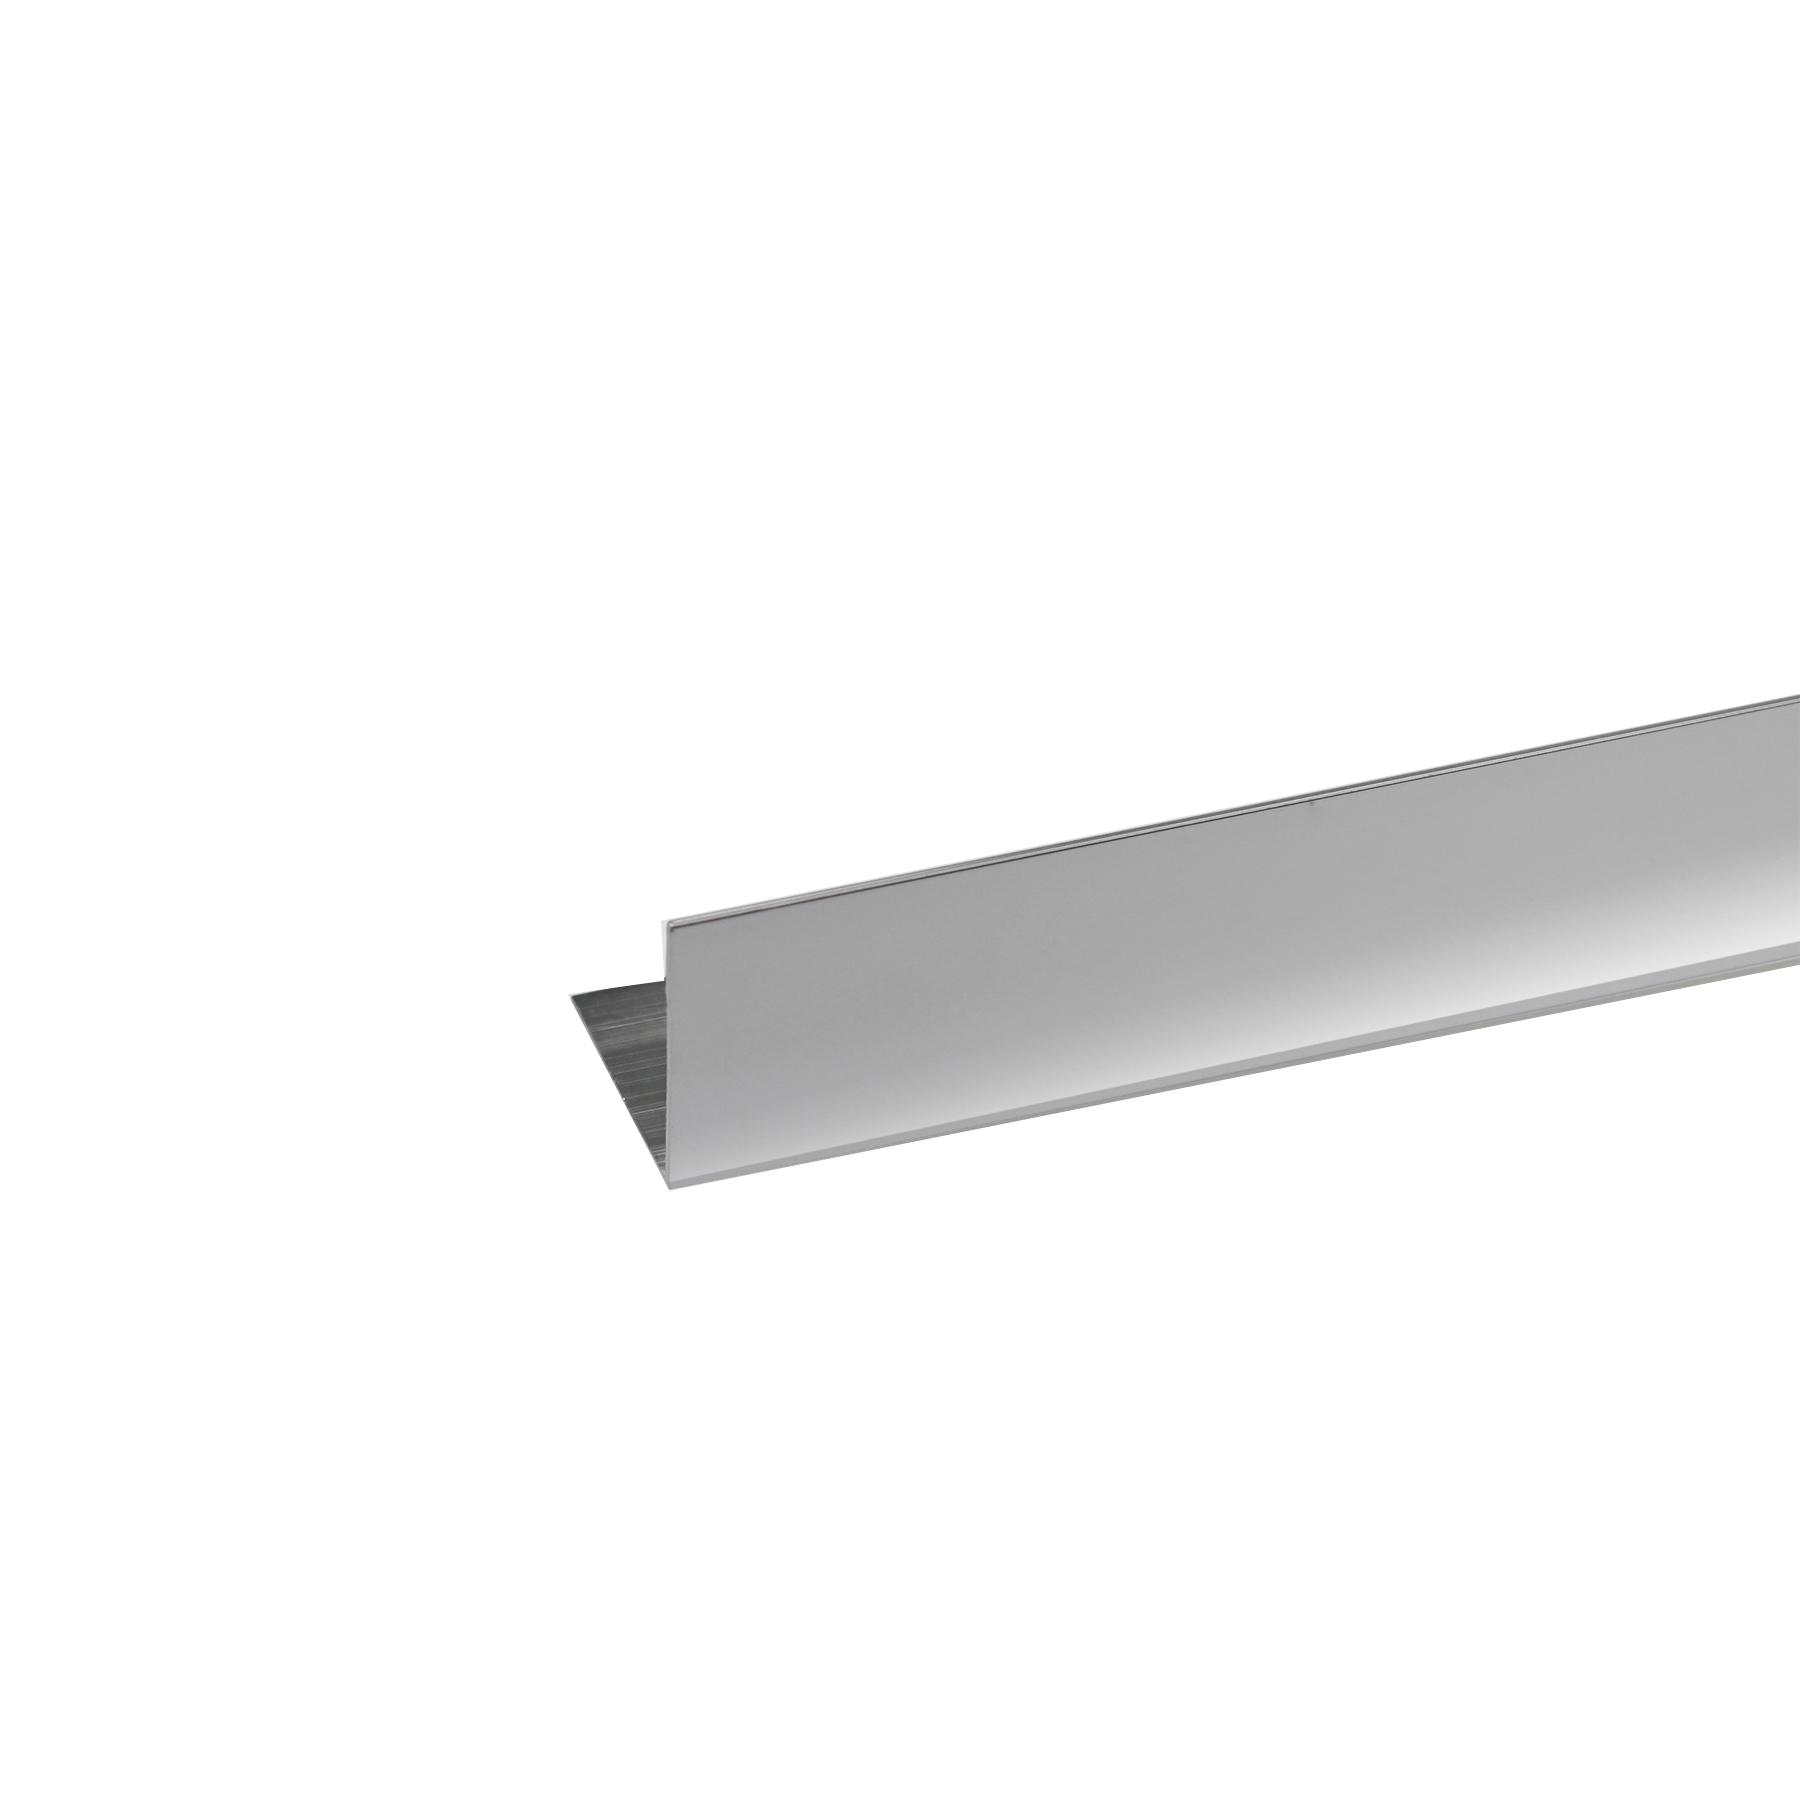 Perfil Canto Alumínio Anodizado Cromado 1mx2cm